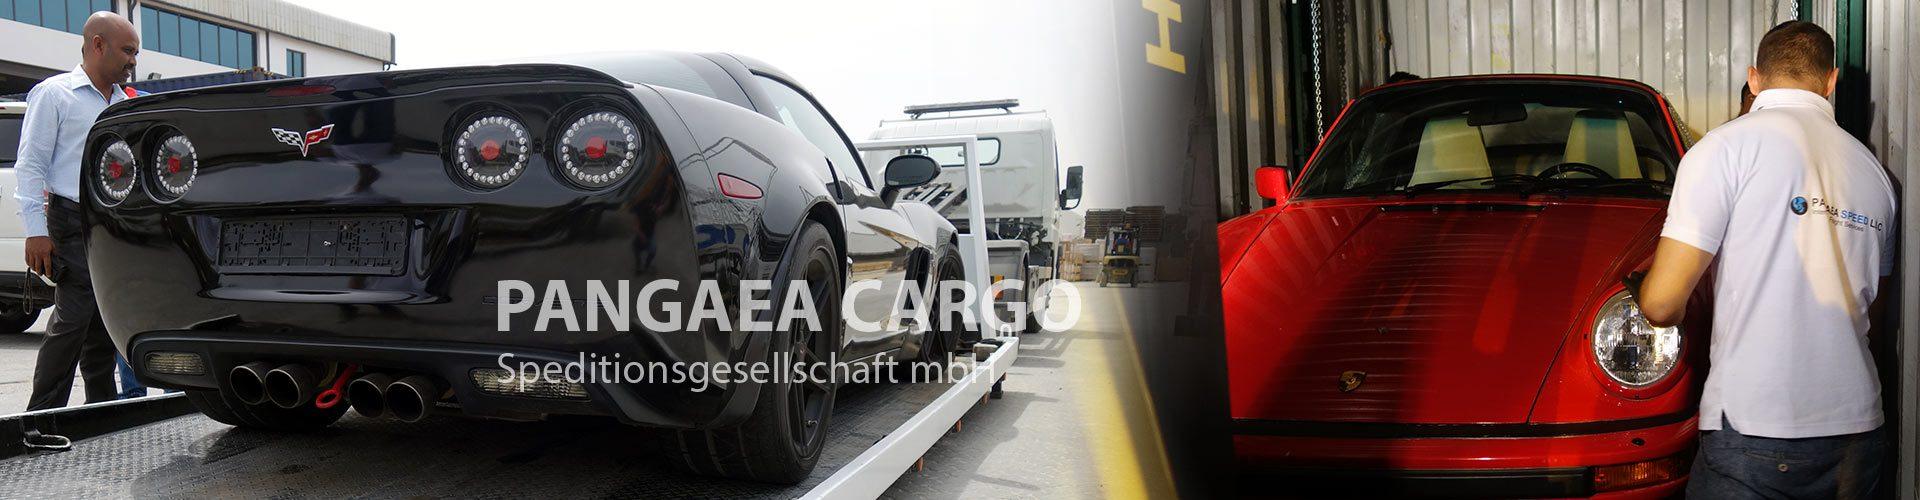 Dubai-Transport-Auto-02